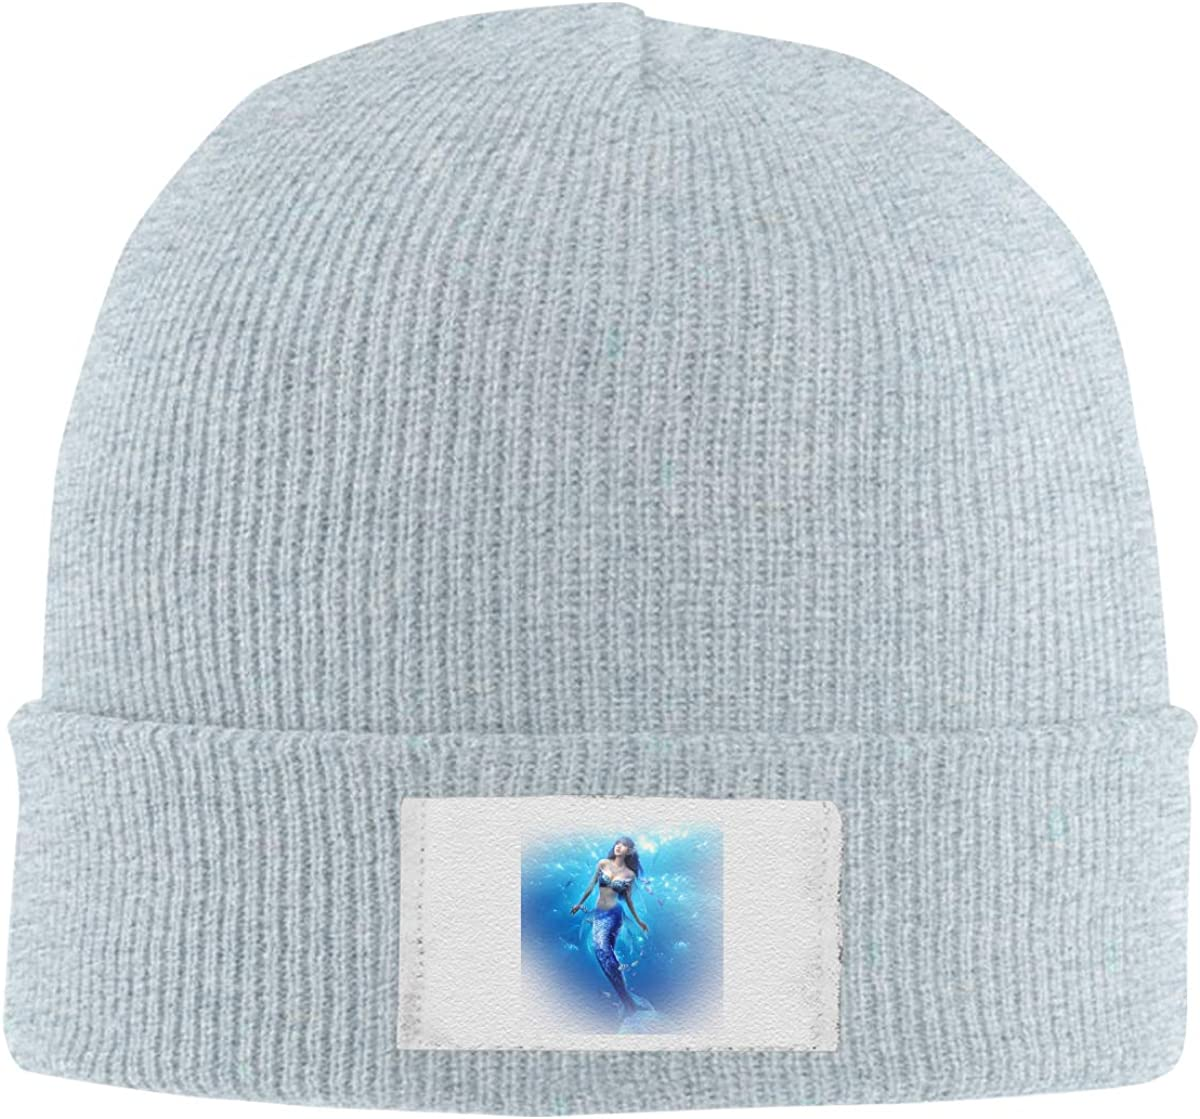 Mermaid Knitted Hat Winter Outdoor Hat Warm Beanie Caps for Men Women